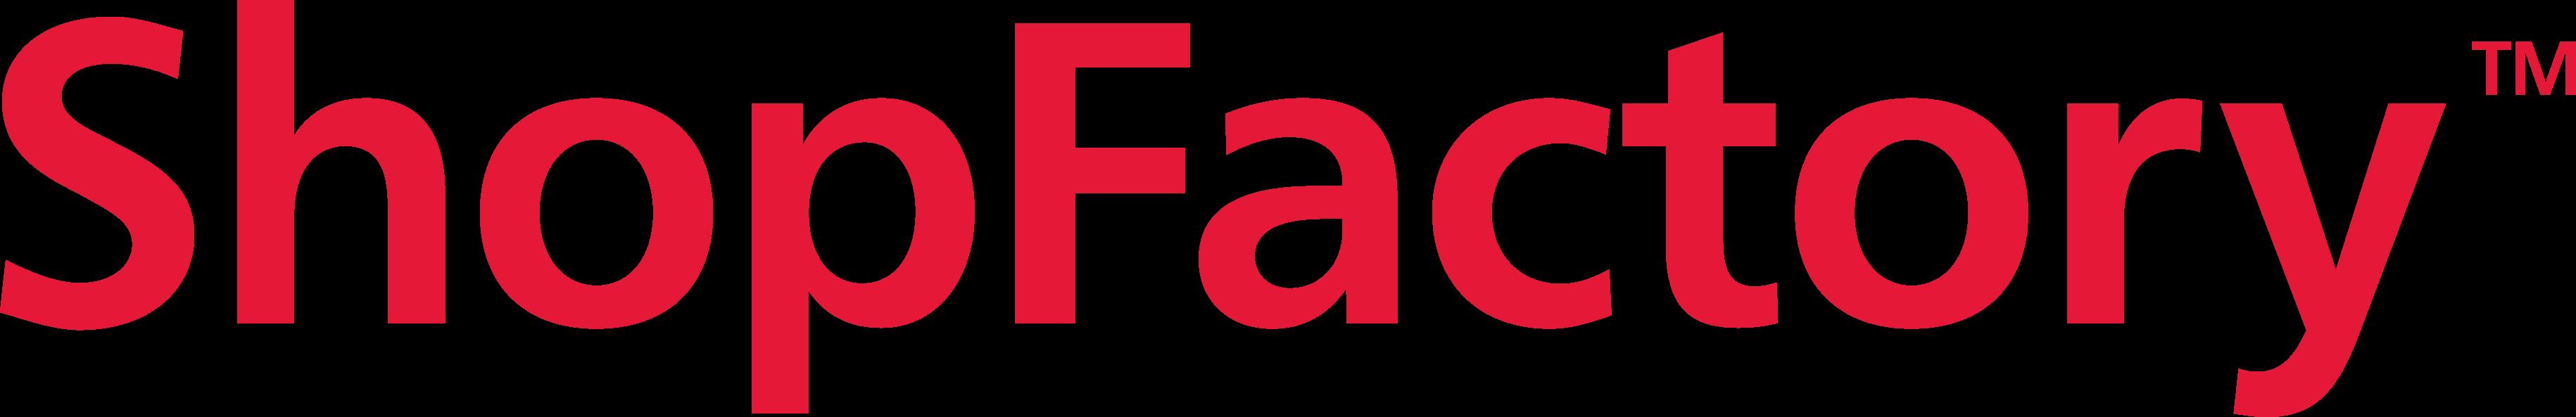 ShopFactory webshop? | Slim en goedkoop verzenden met Shops United